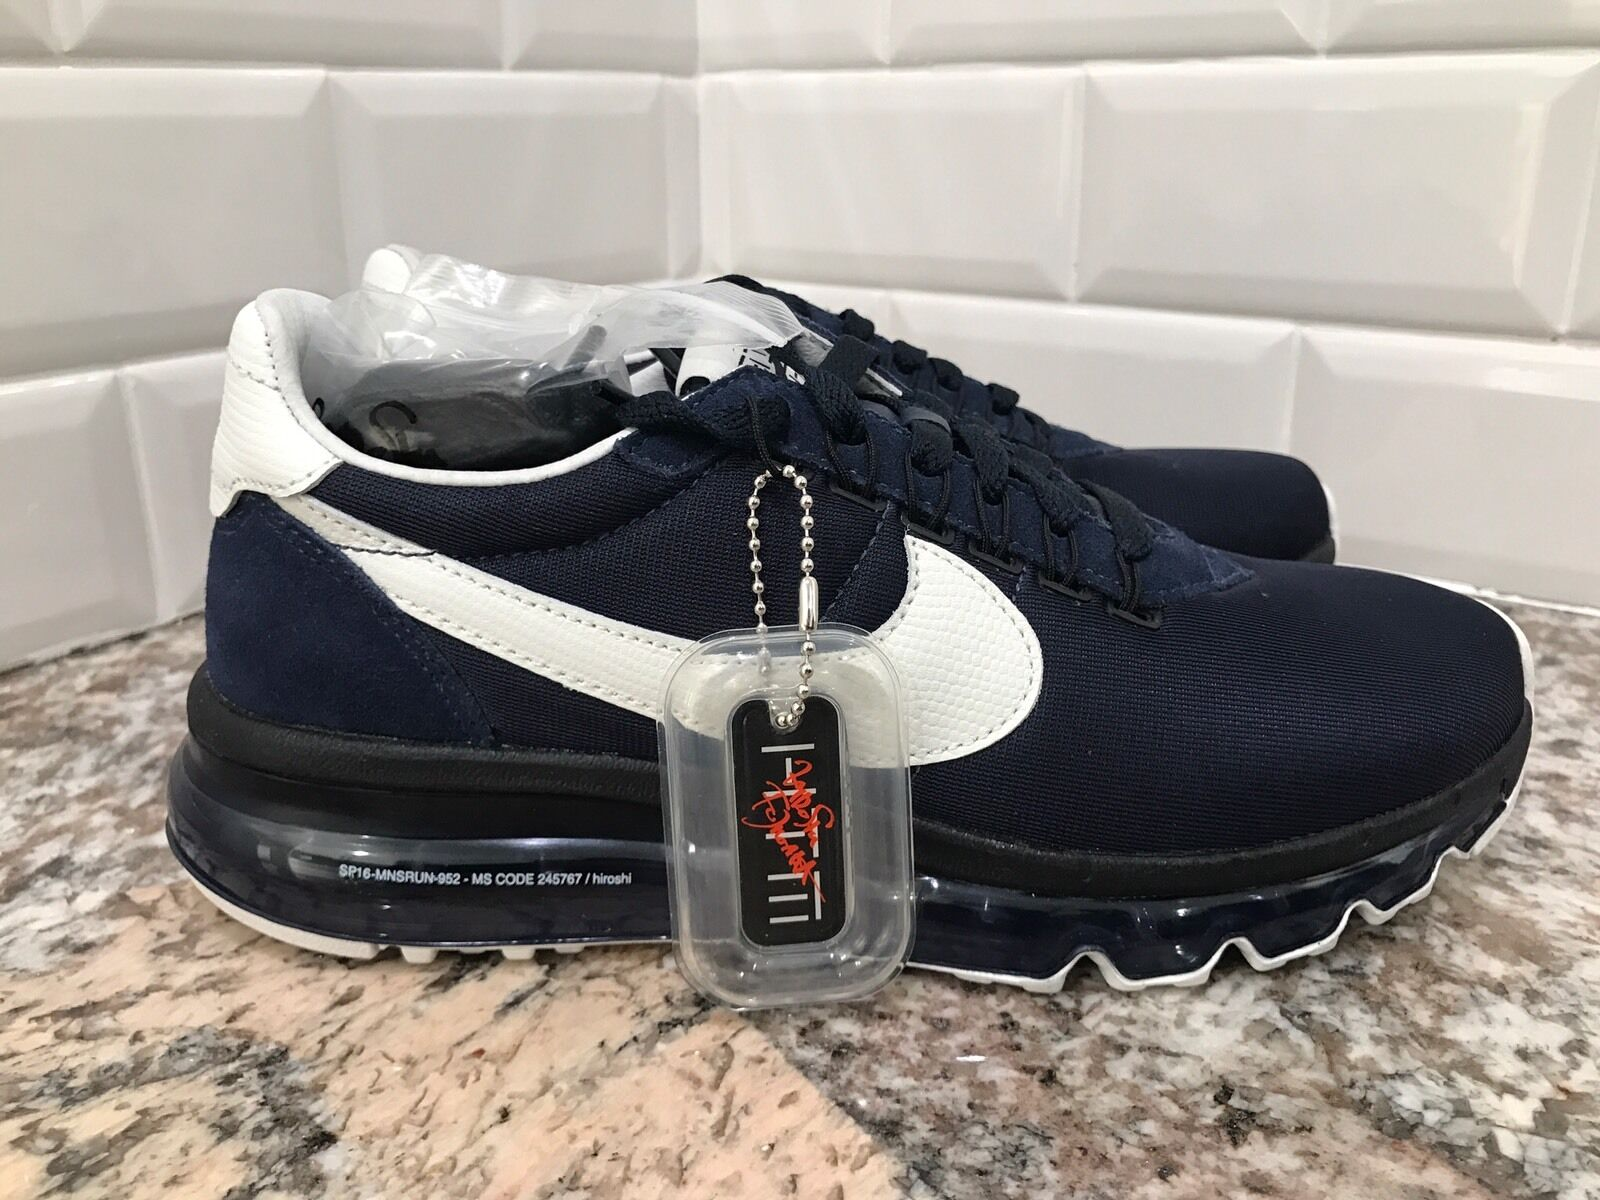 Nike Air Max 2016 LD-Zero Hiroshi Fujiwara shoes Obsidian White SZ 6 848624-410